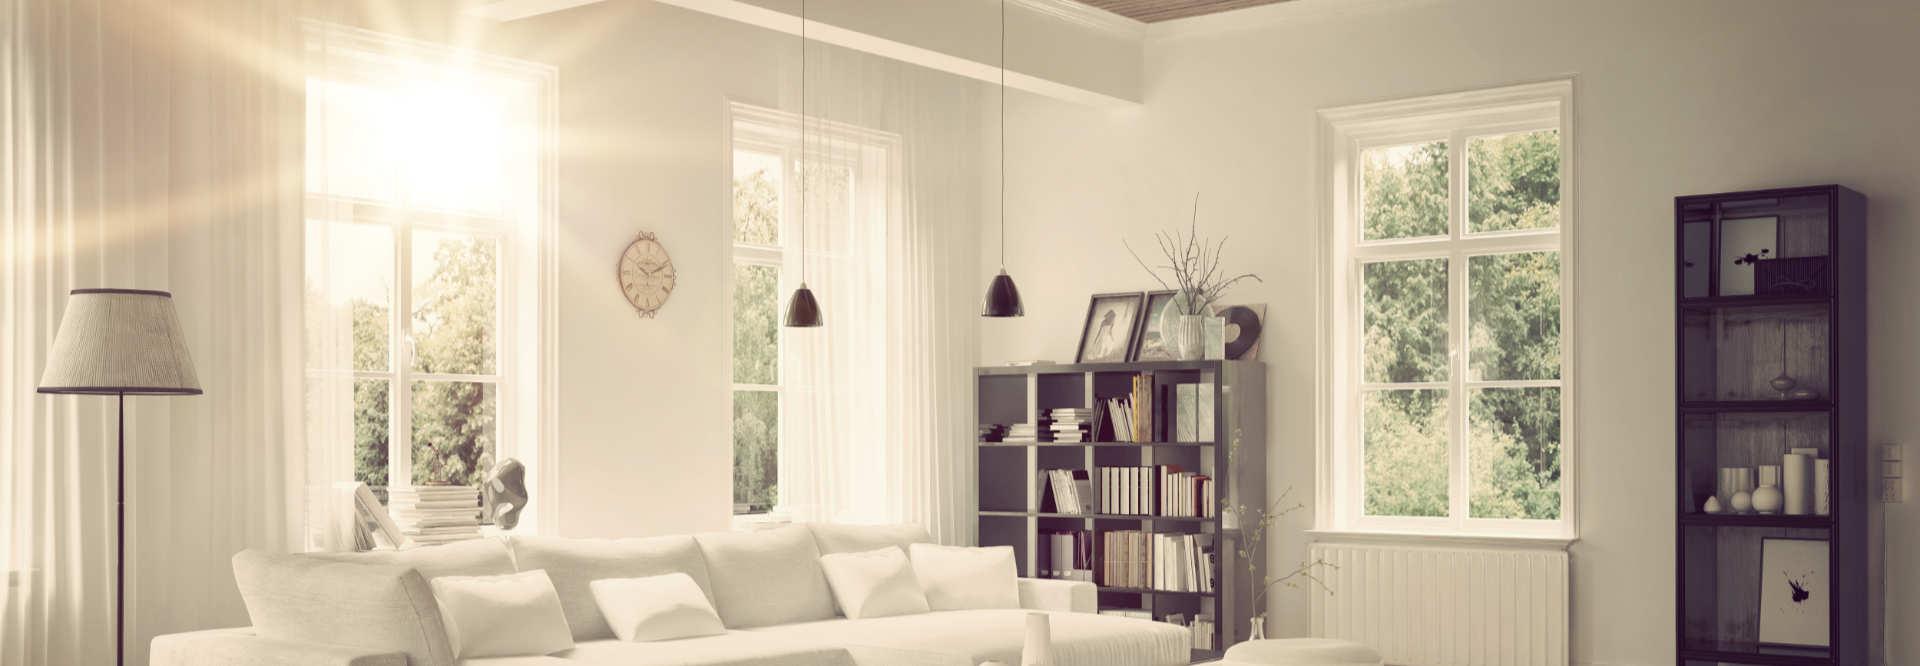 Ohlala Home - Immobilien Wien